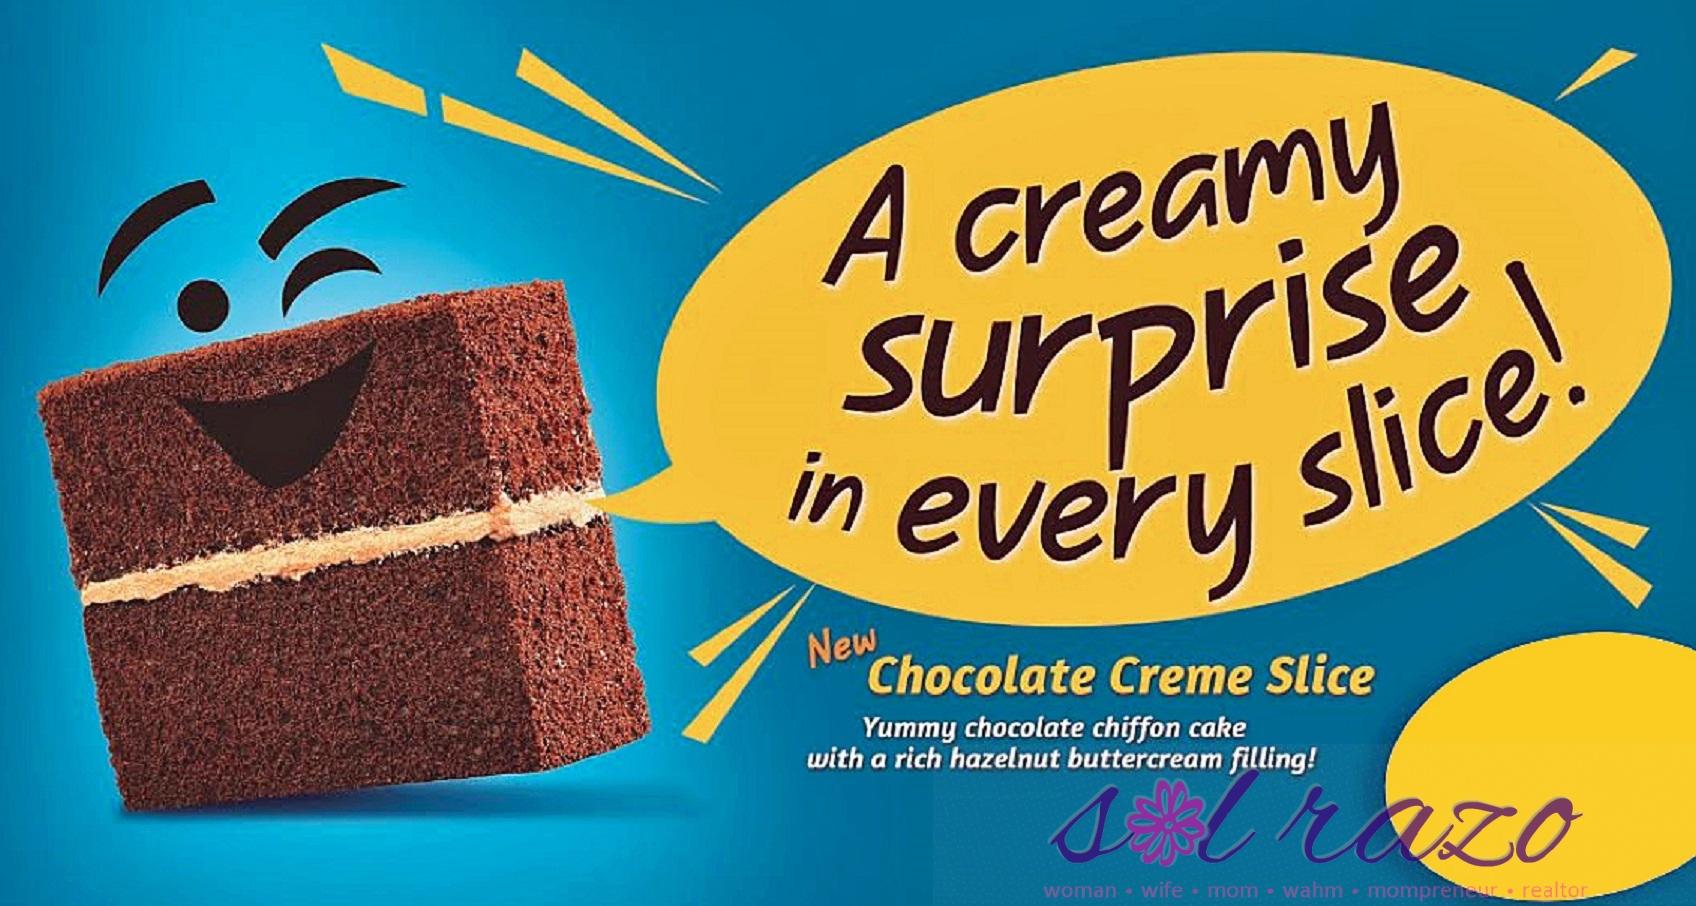 Choco Creme Slice